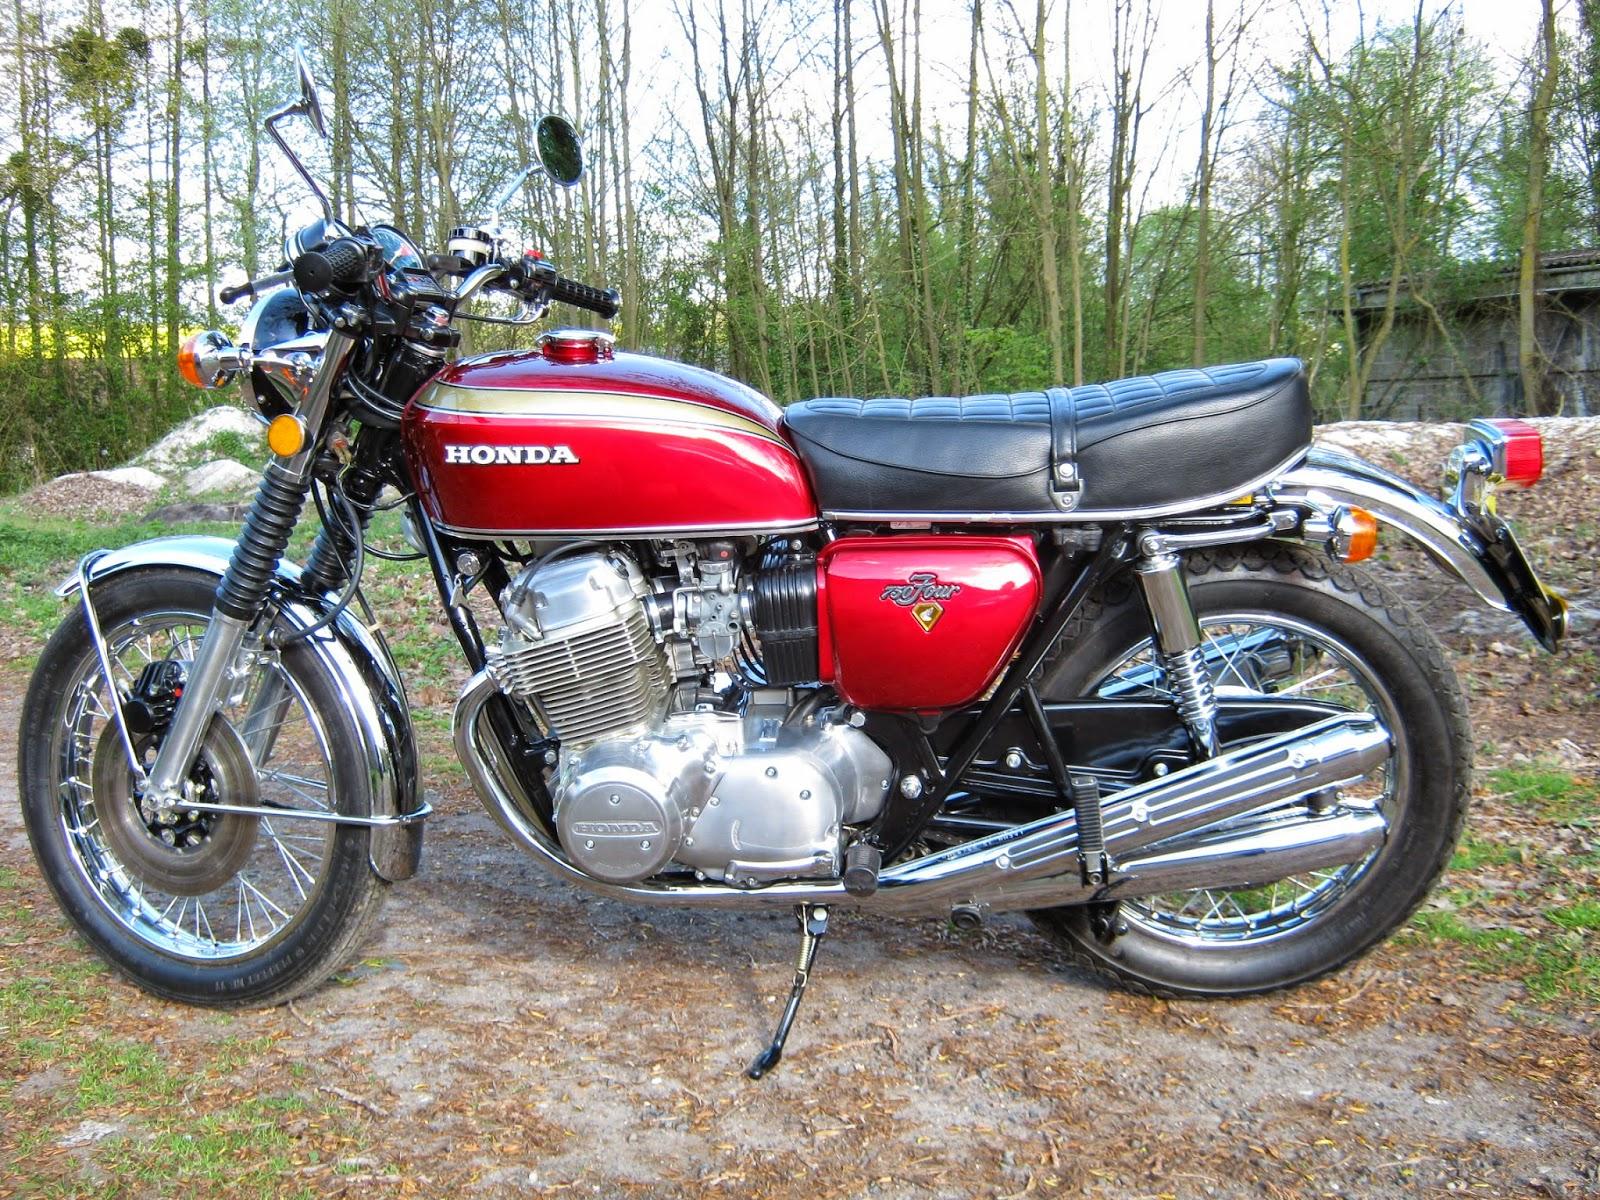 croco deco moto honda 750 four k2 1972 candy rouge restauration compl te 100 d 39 origine. Black Bedroom Furniture Sets. Home Design Ideas